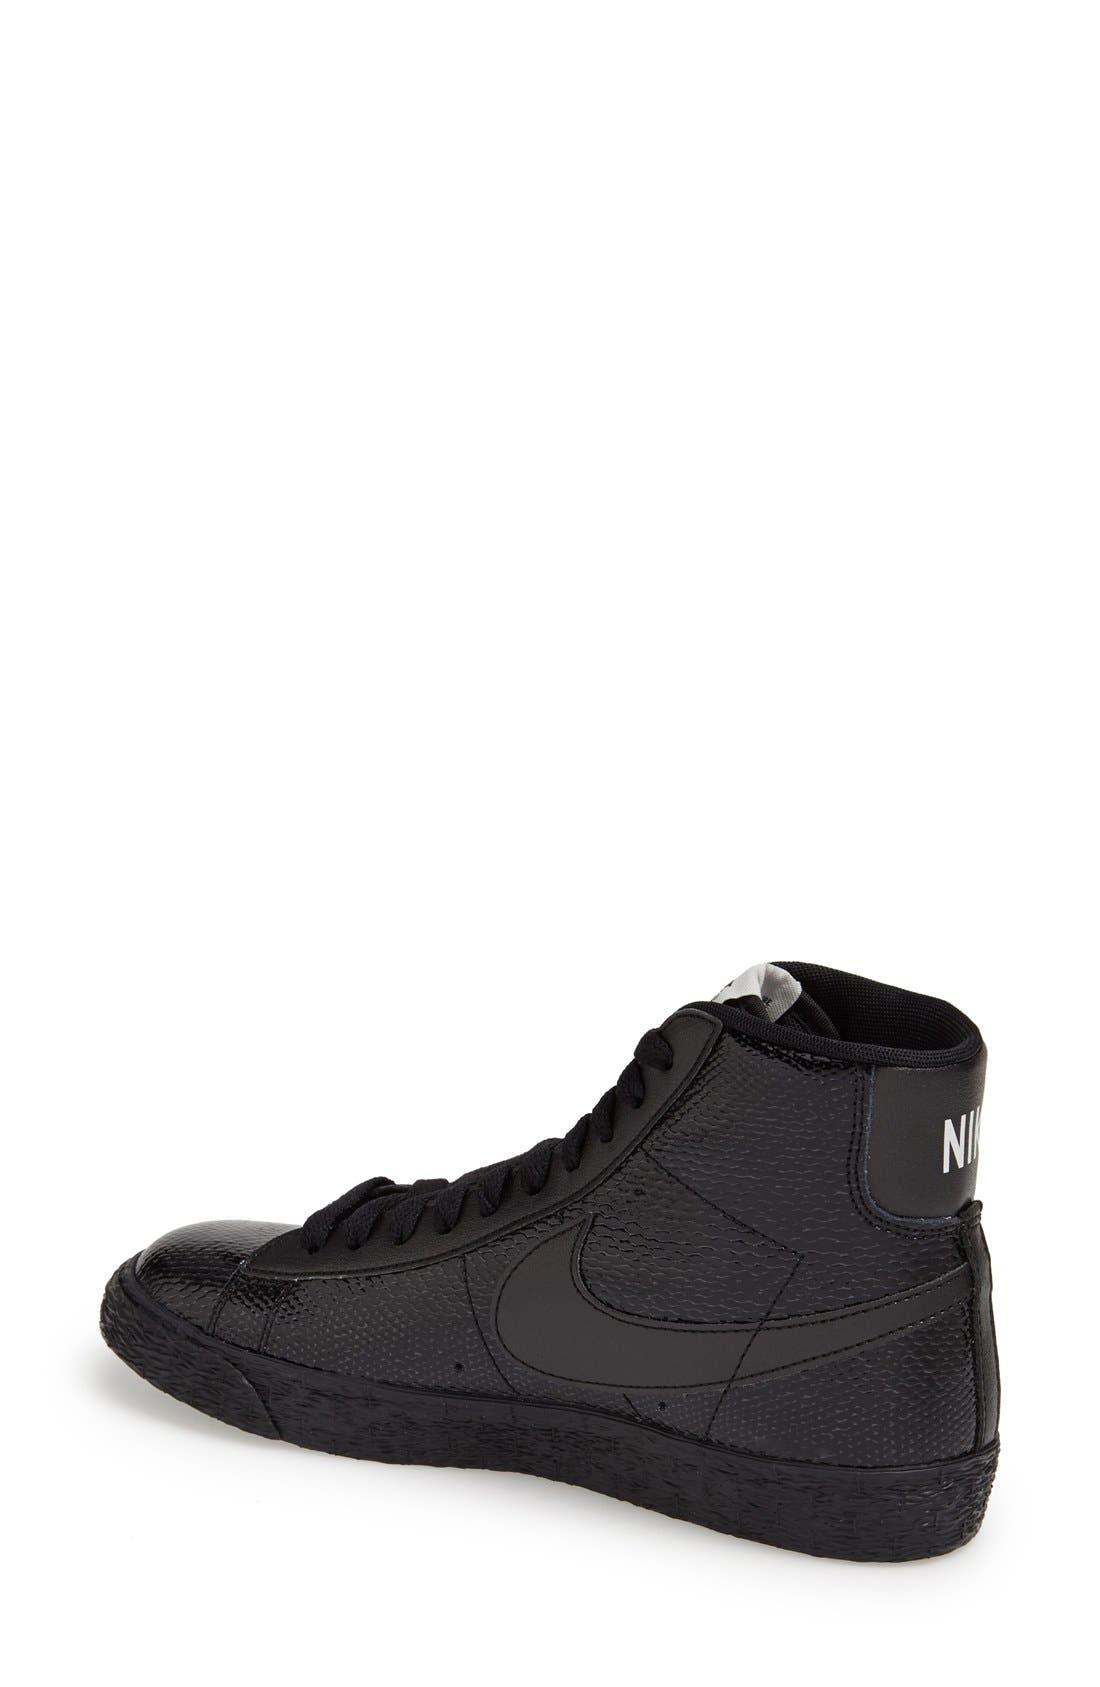 Alternate Image 2  - Nike 'Blazer Mid' Sneaker (Women)